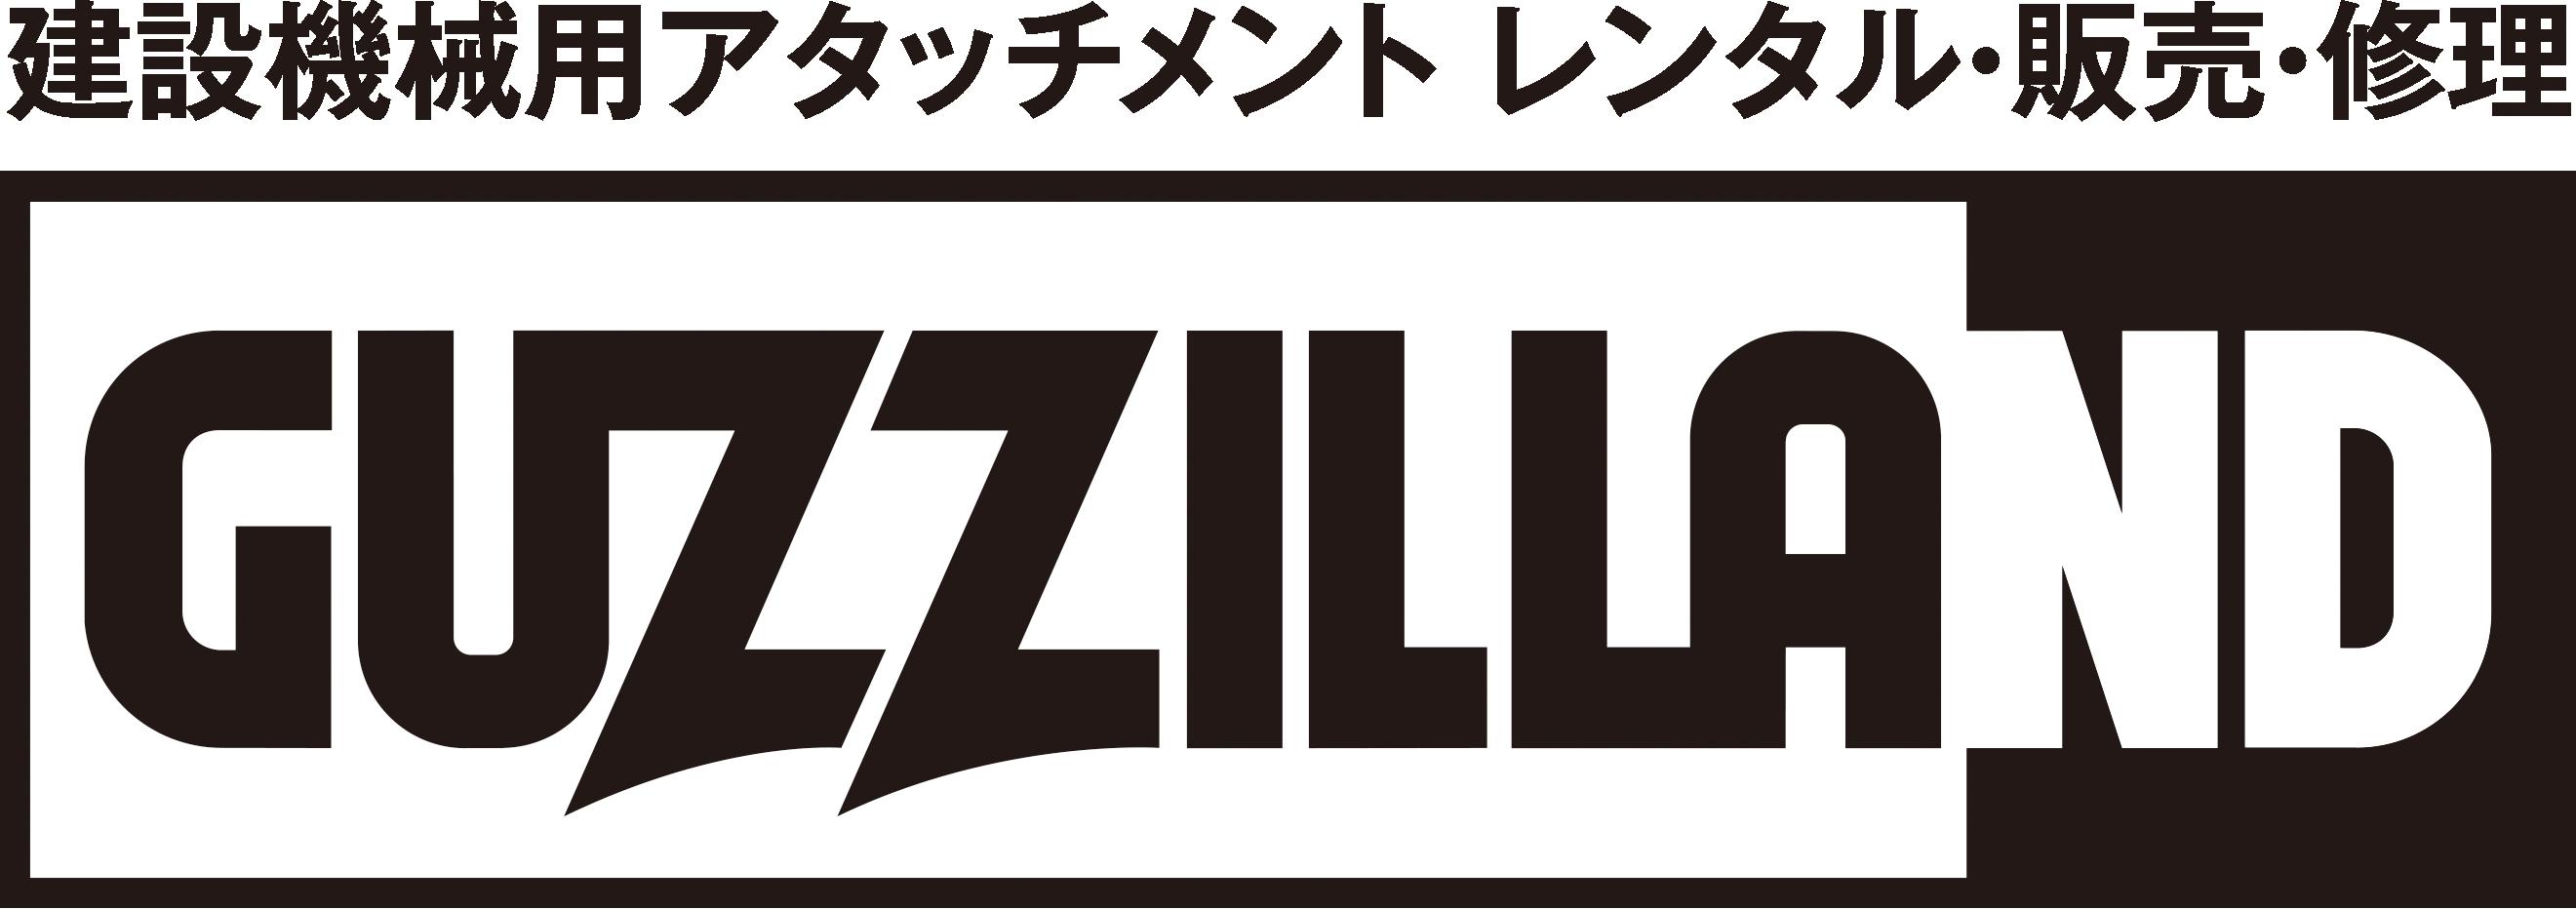 GUZZILLAND_logo